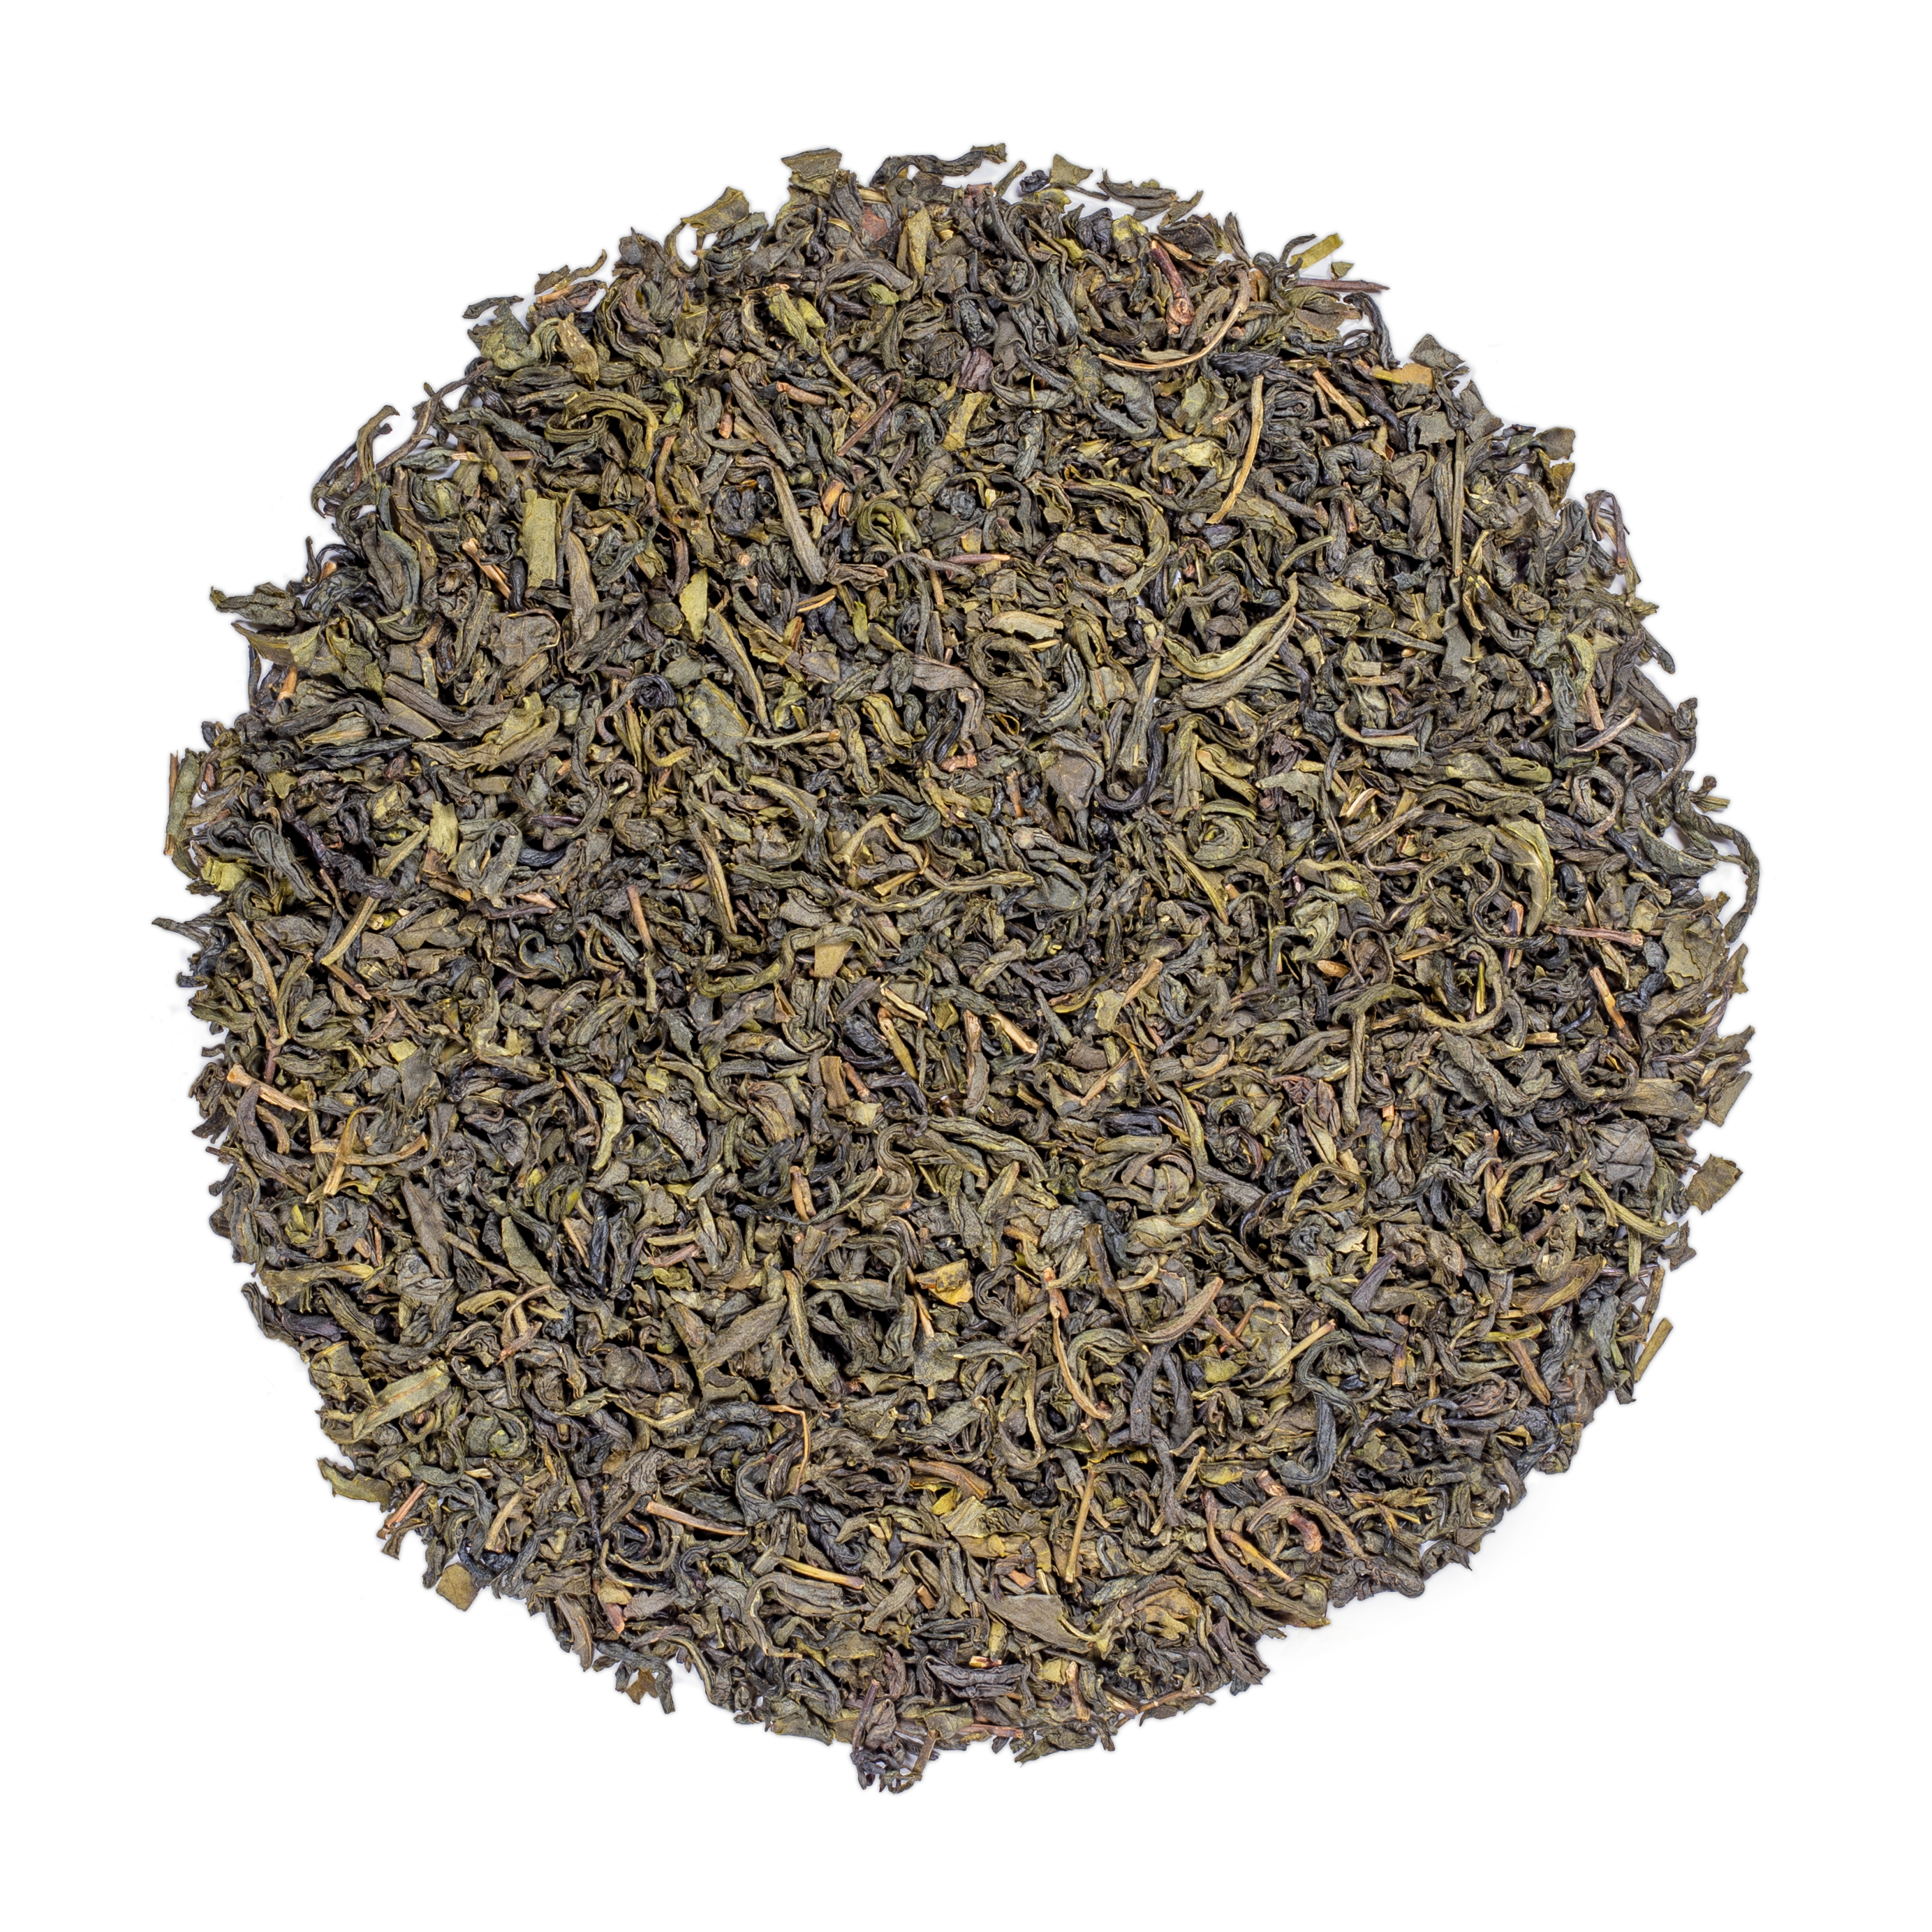 Thé vert - Thé vert saveur gingembre-citron - Vrac - Kusmi Tea